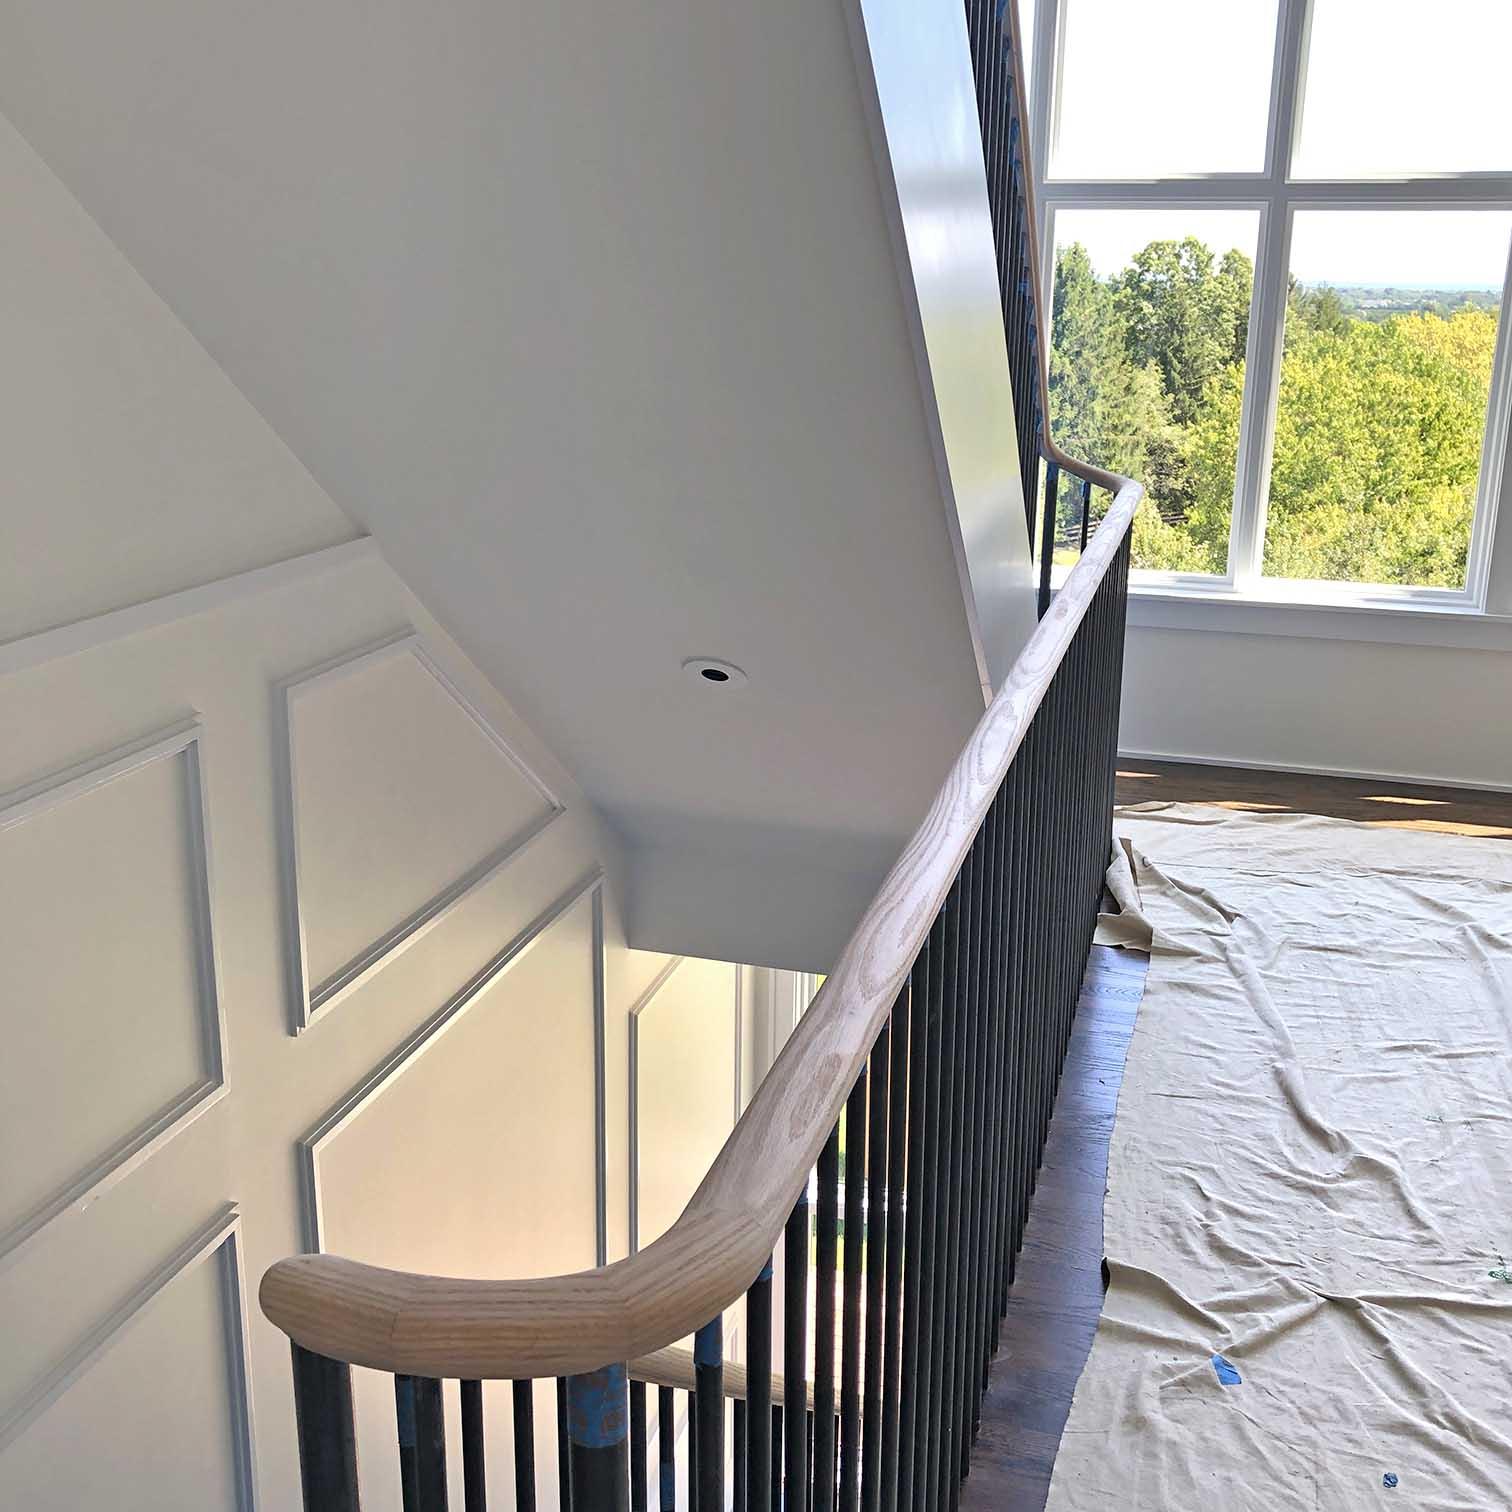 handrail_2.jpg